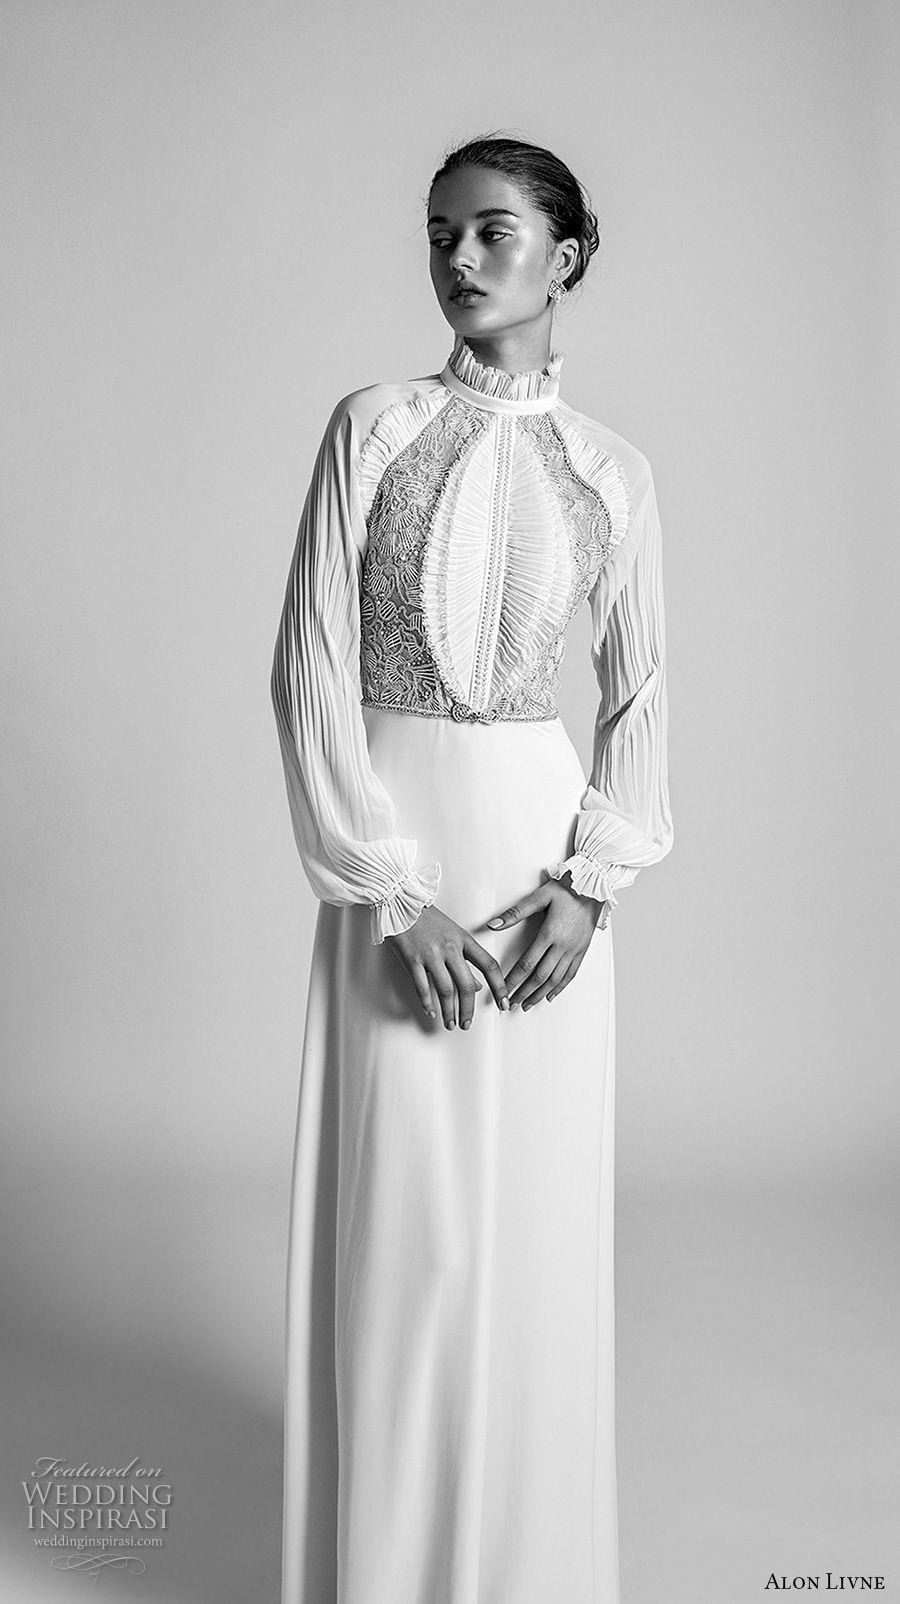 Alon livné white wedding dresses u ucwild orchidud bridal